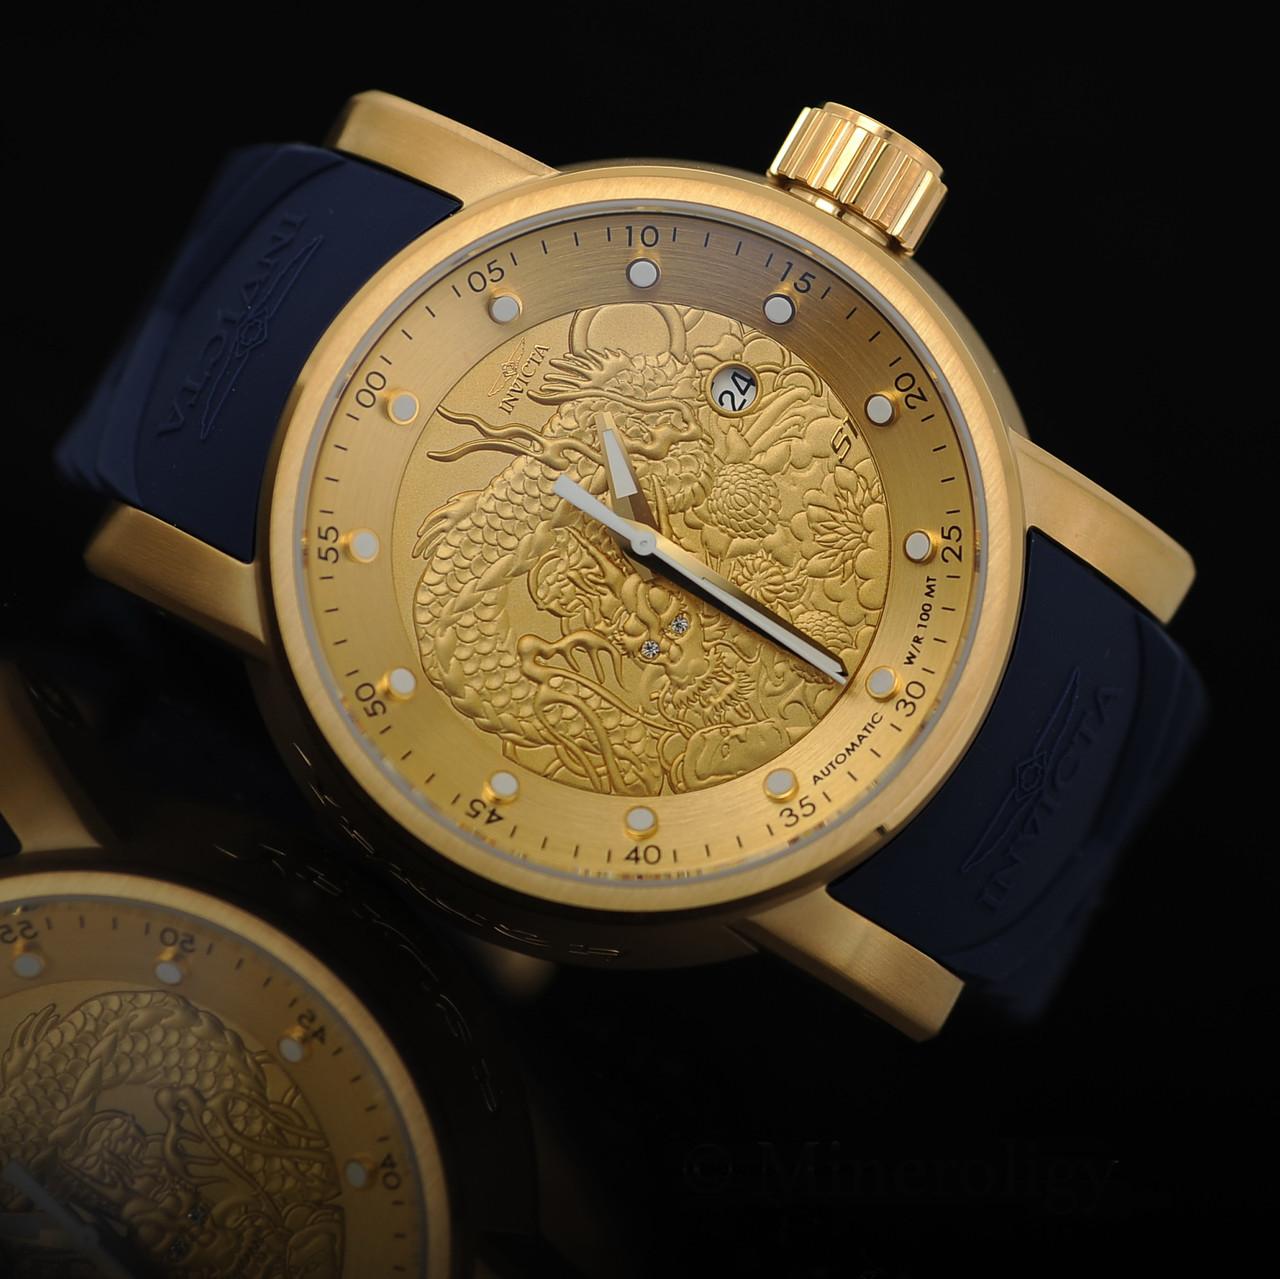 99802e02f4df Мужские часы INVICTA 18215 Yakuza Dragon, цена 8 636 грн., купить ...